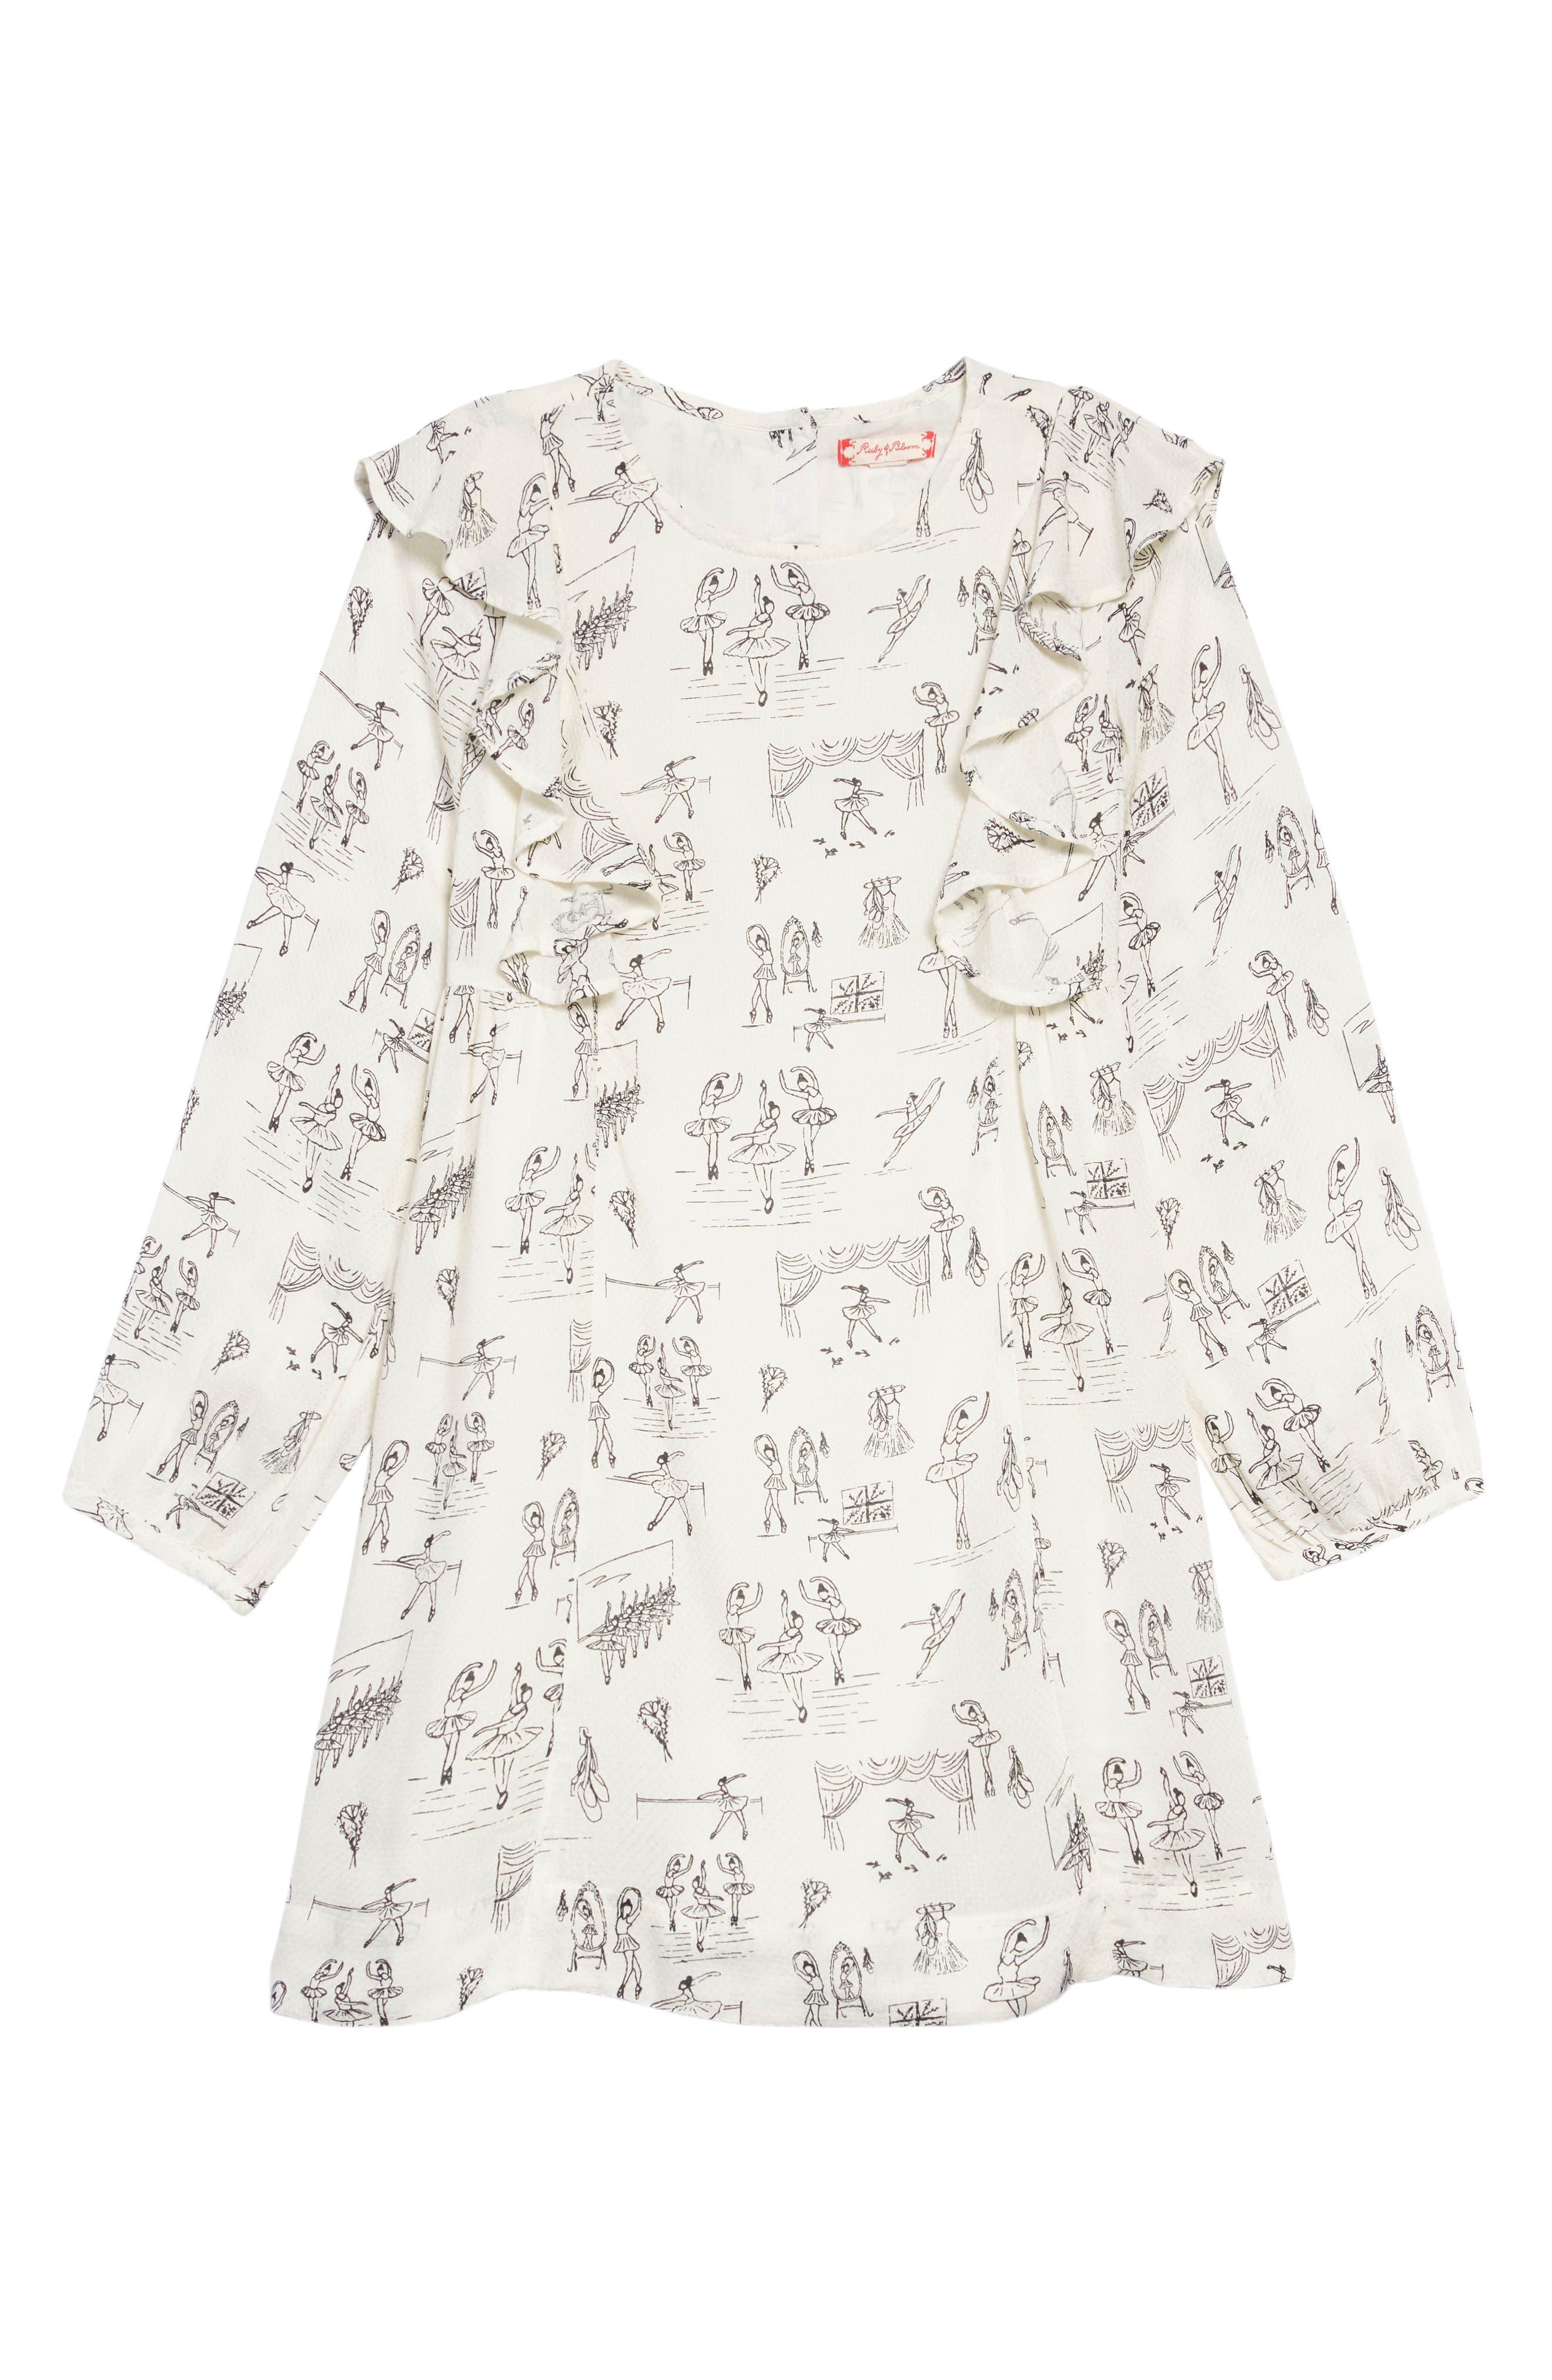 Ballet Print Ruffle Dress,                         Main,                         color, IVORY EGRET BALLET